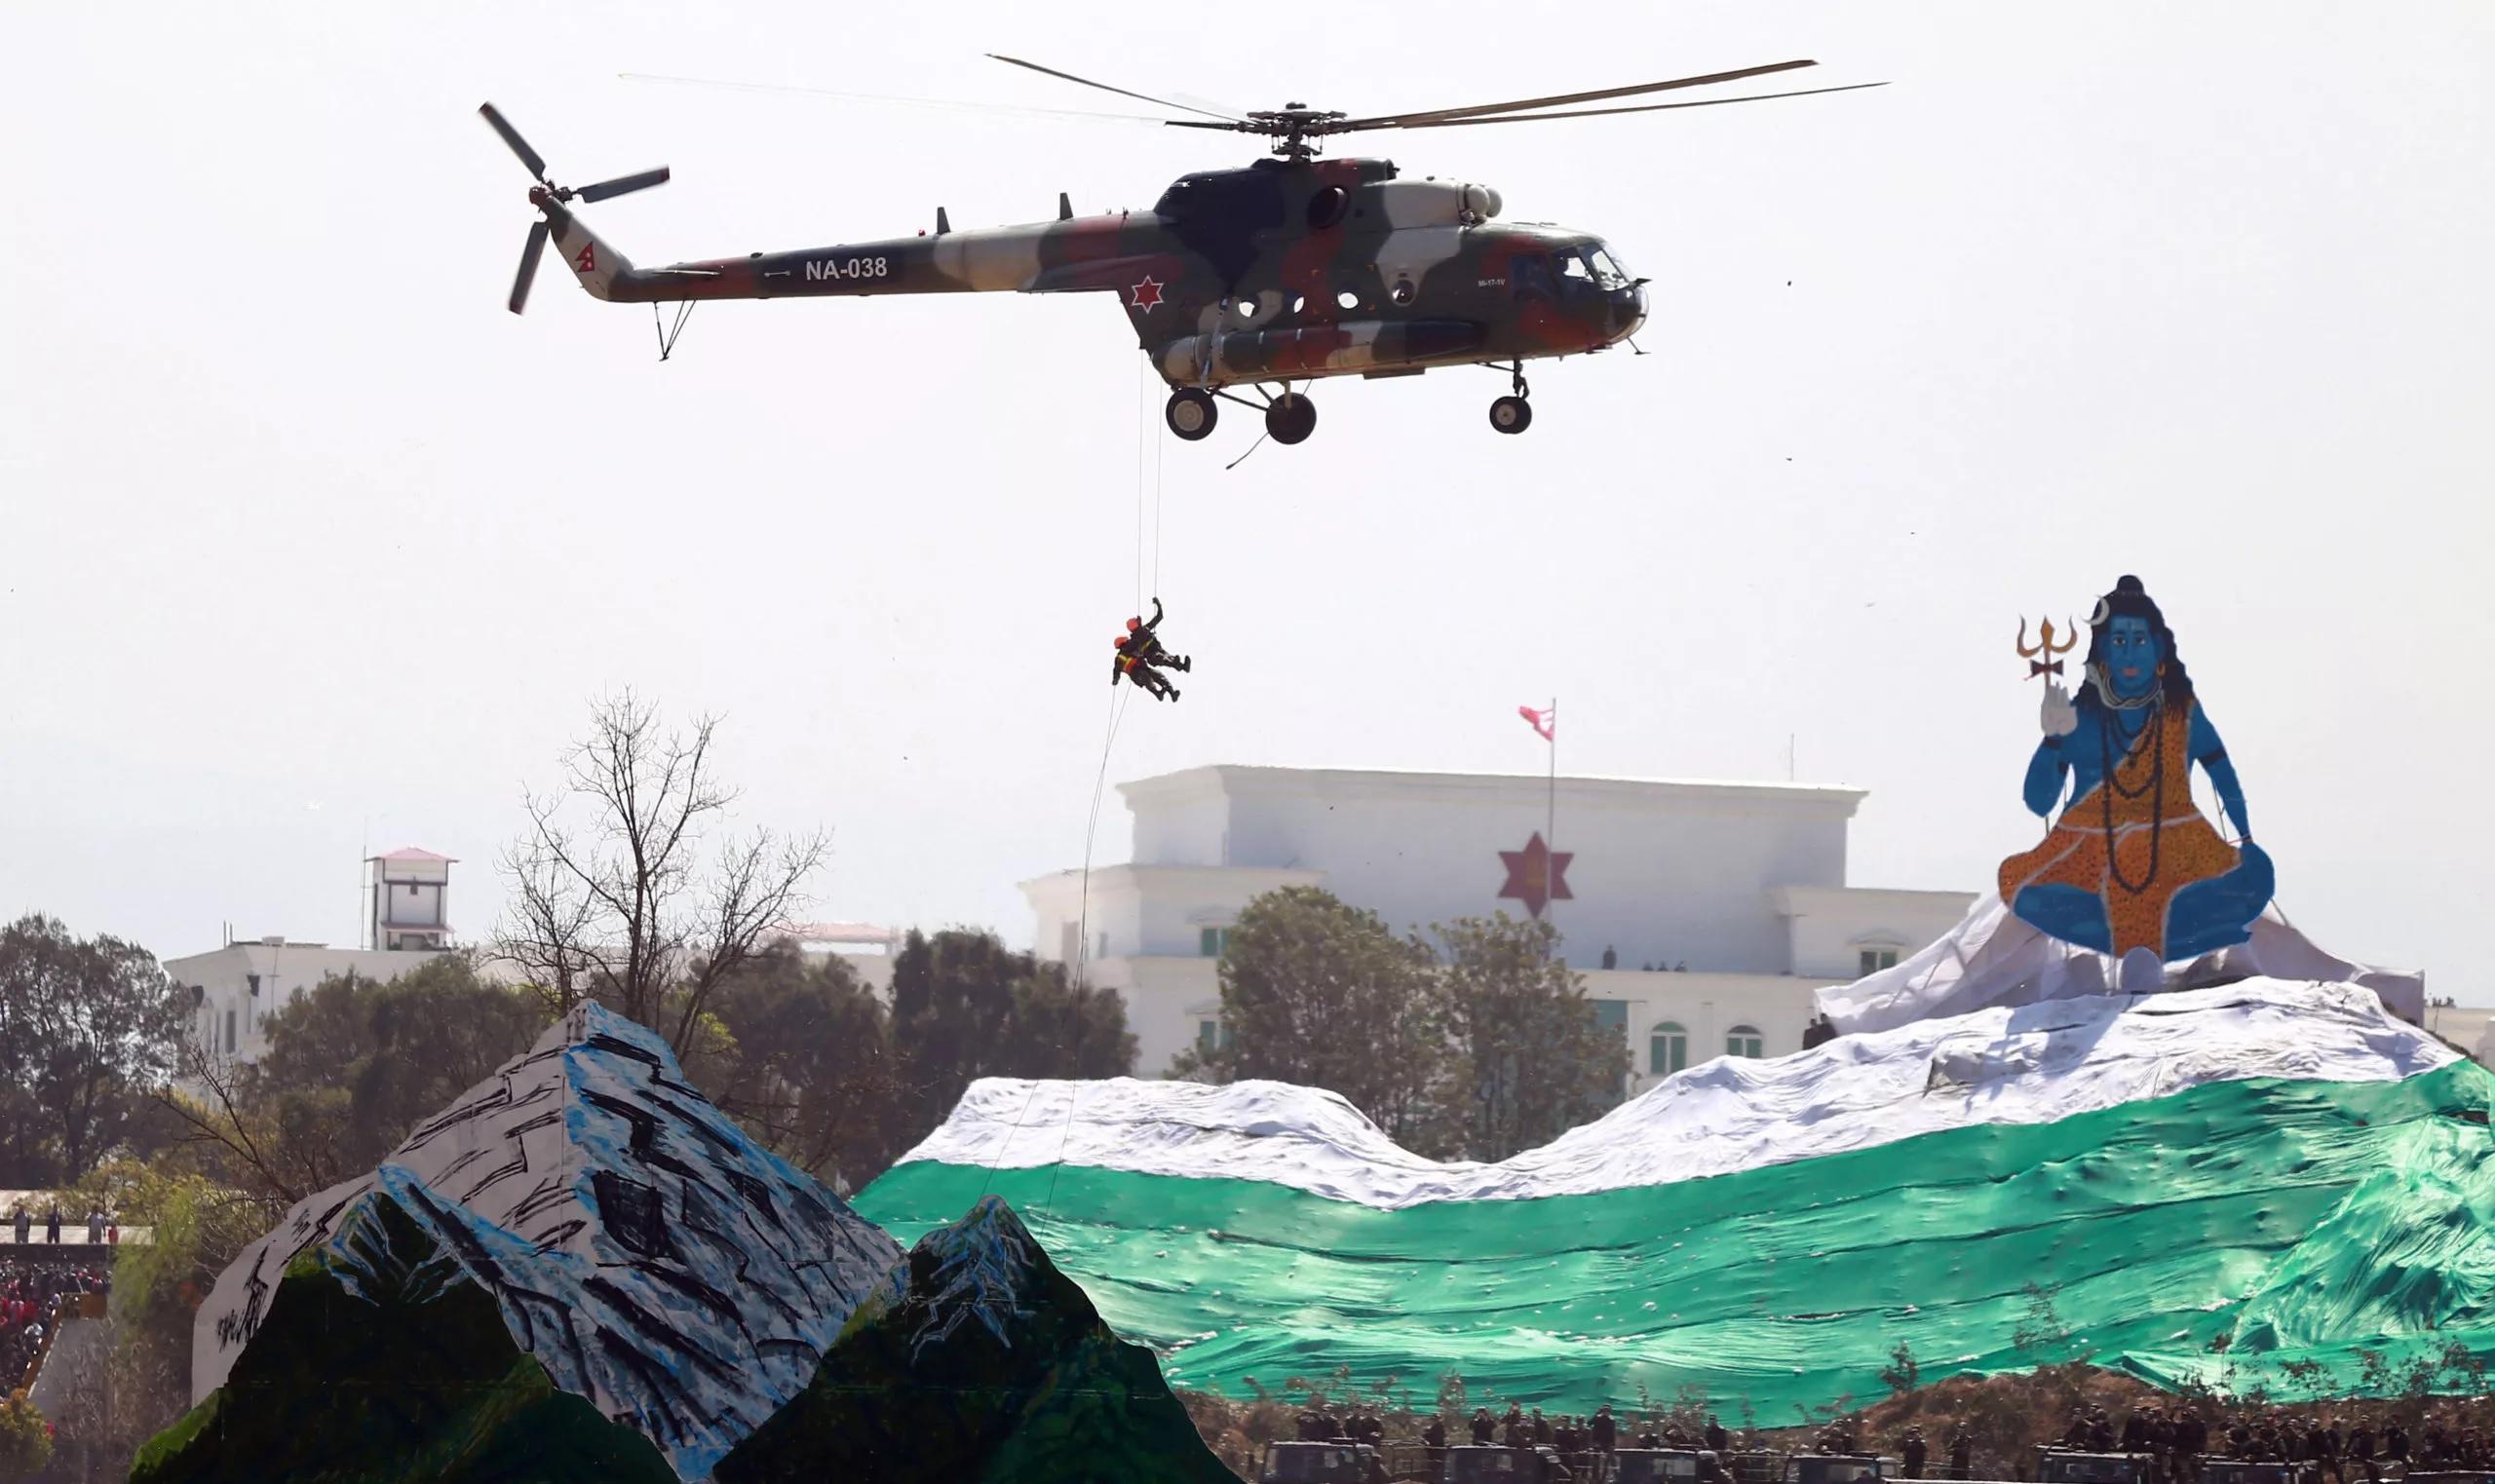 Celebration of Army Day